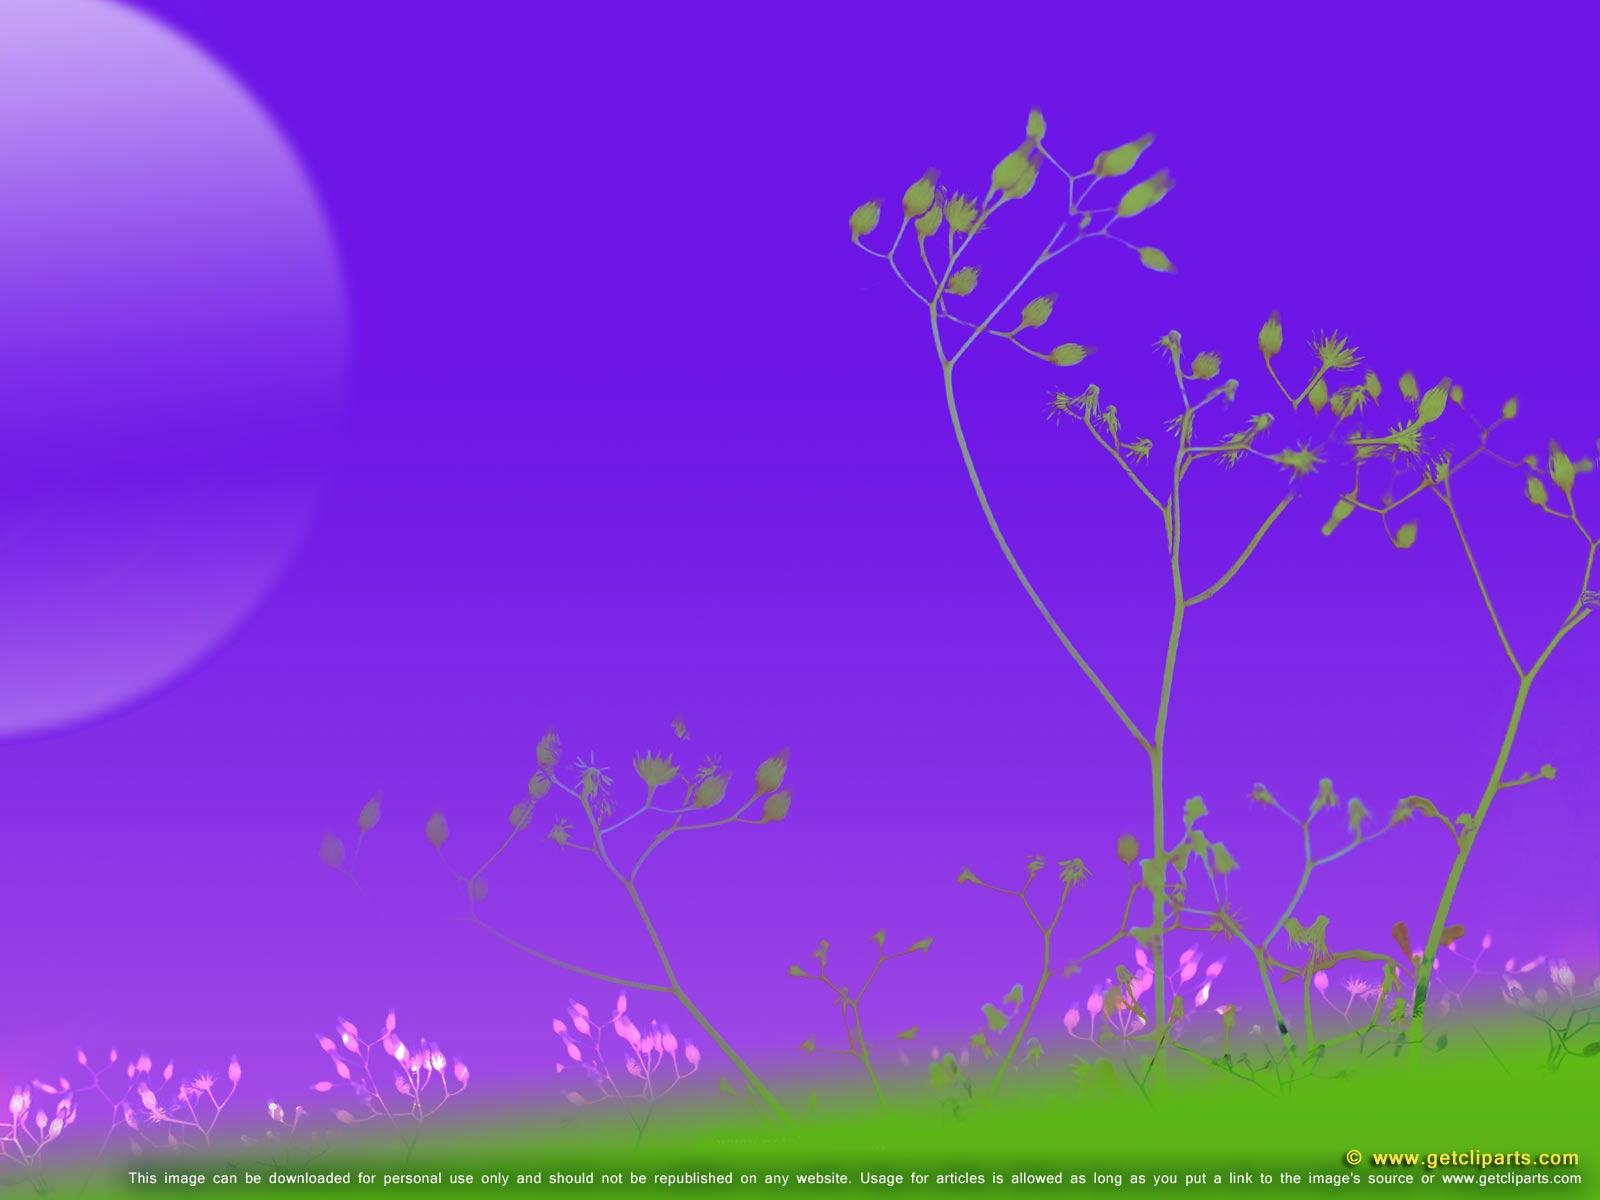 Tajanstvenim stazama duse... - Page 21 Moon-violet-1600x1200